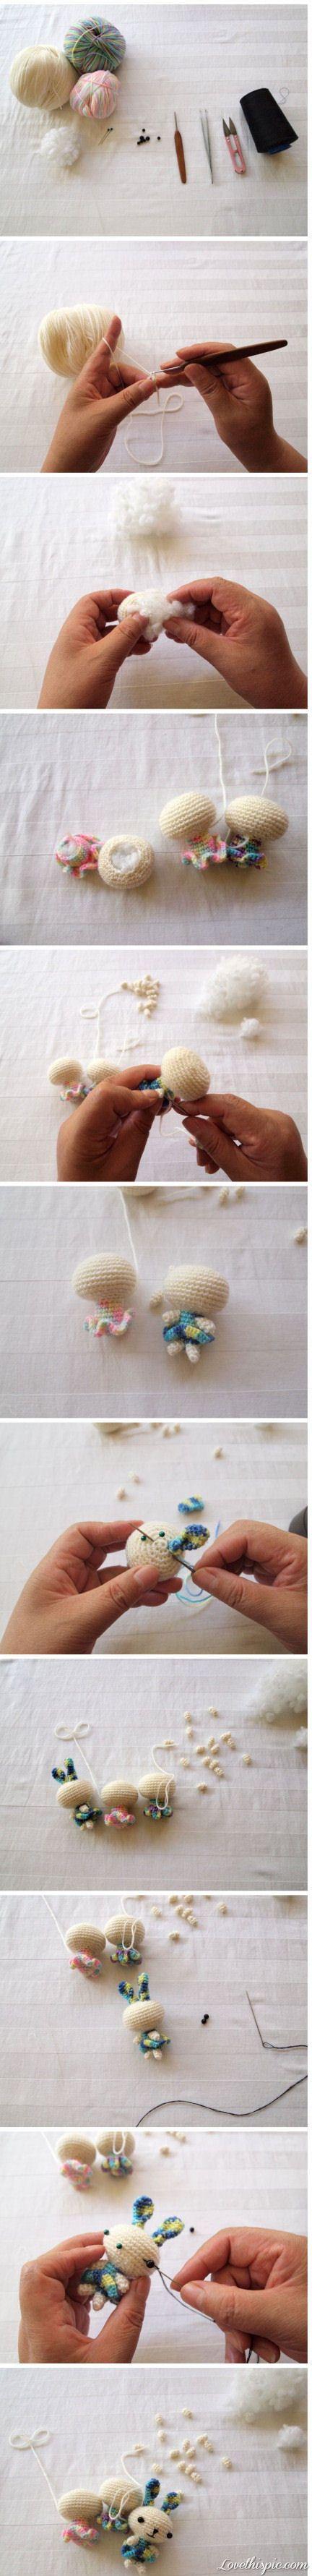 DIY Stuffed Animals diy sew craft crafts craft idea diy ideas diy crafts sewing easy diy diy gifts sewing crafts craft gift